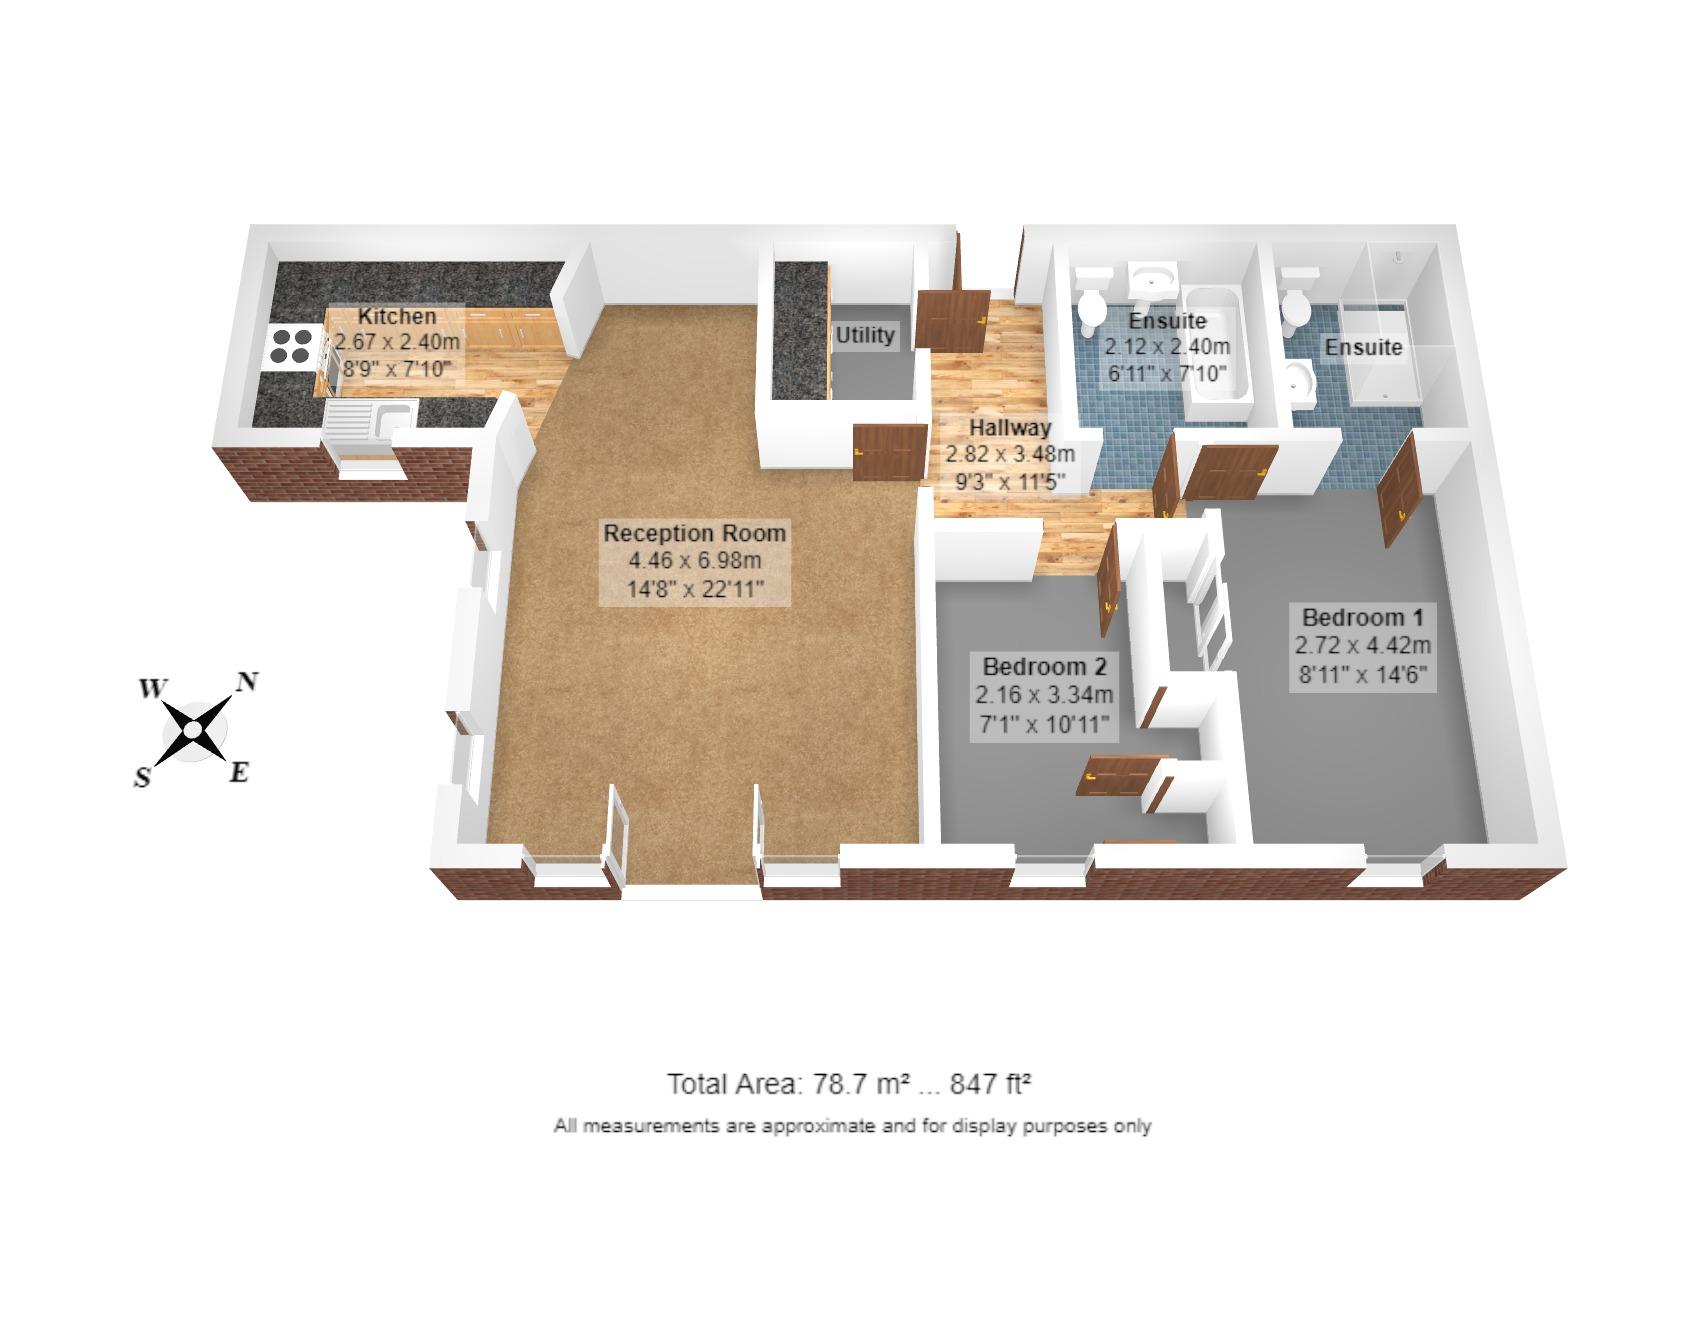 17 Homewood Court Floorplan